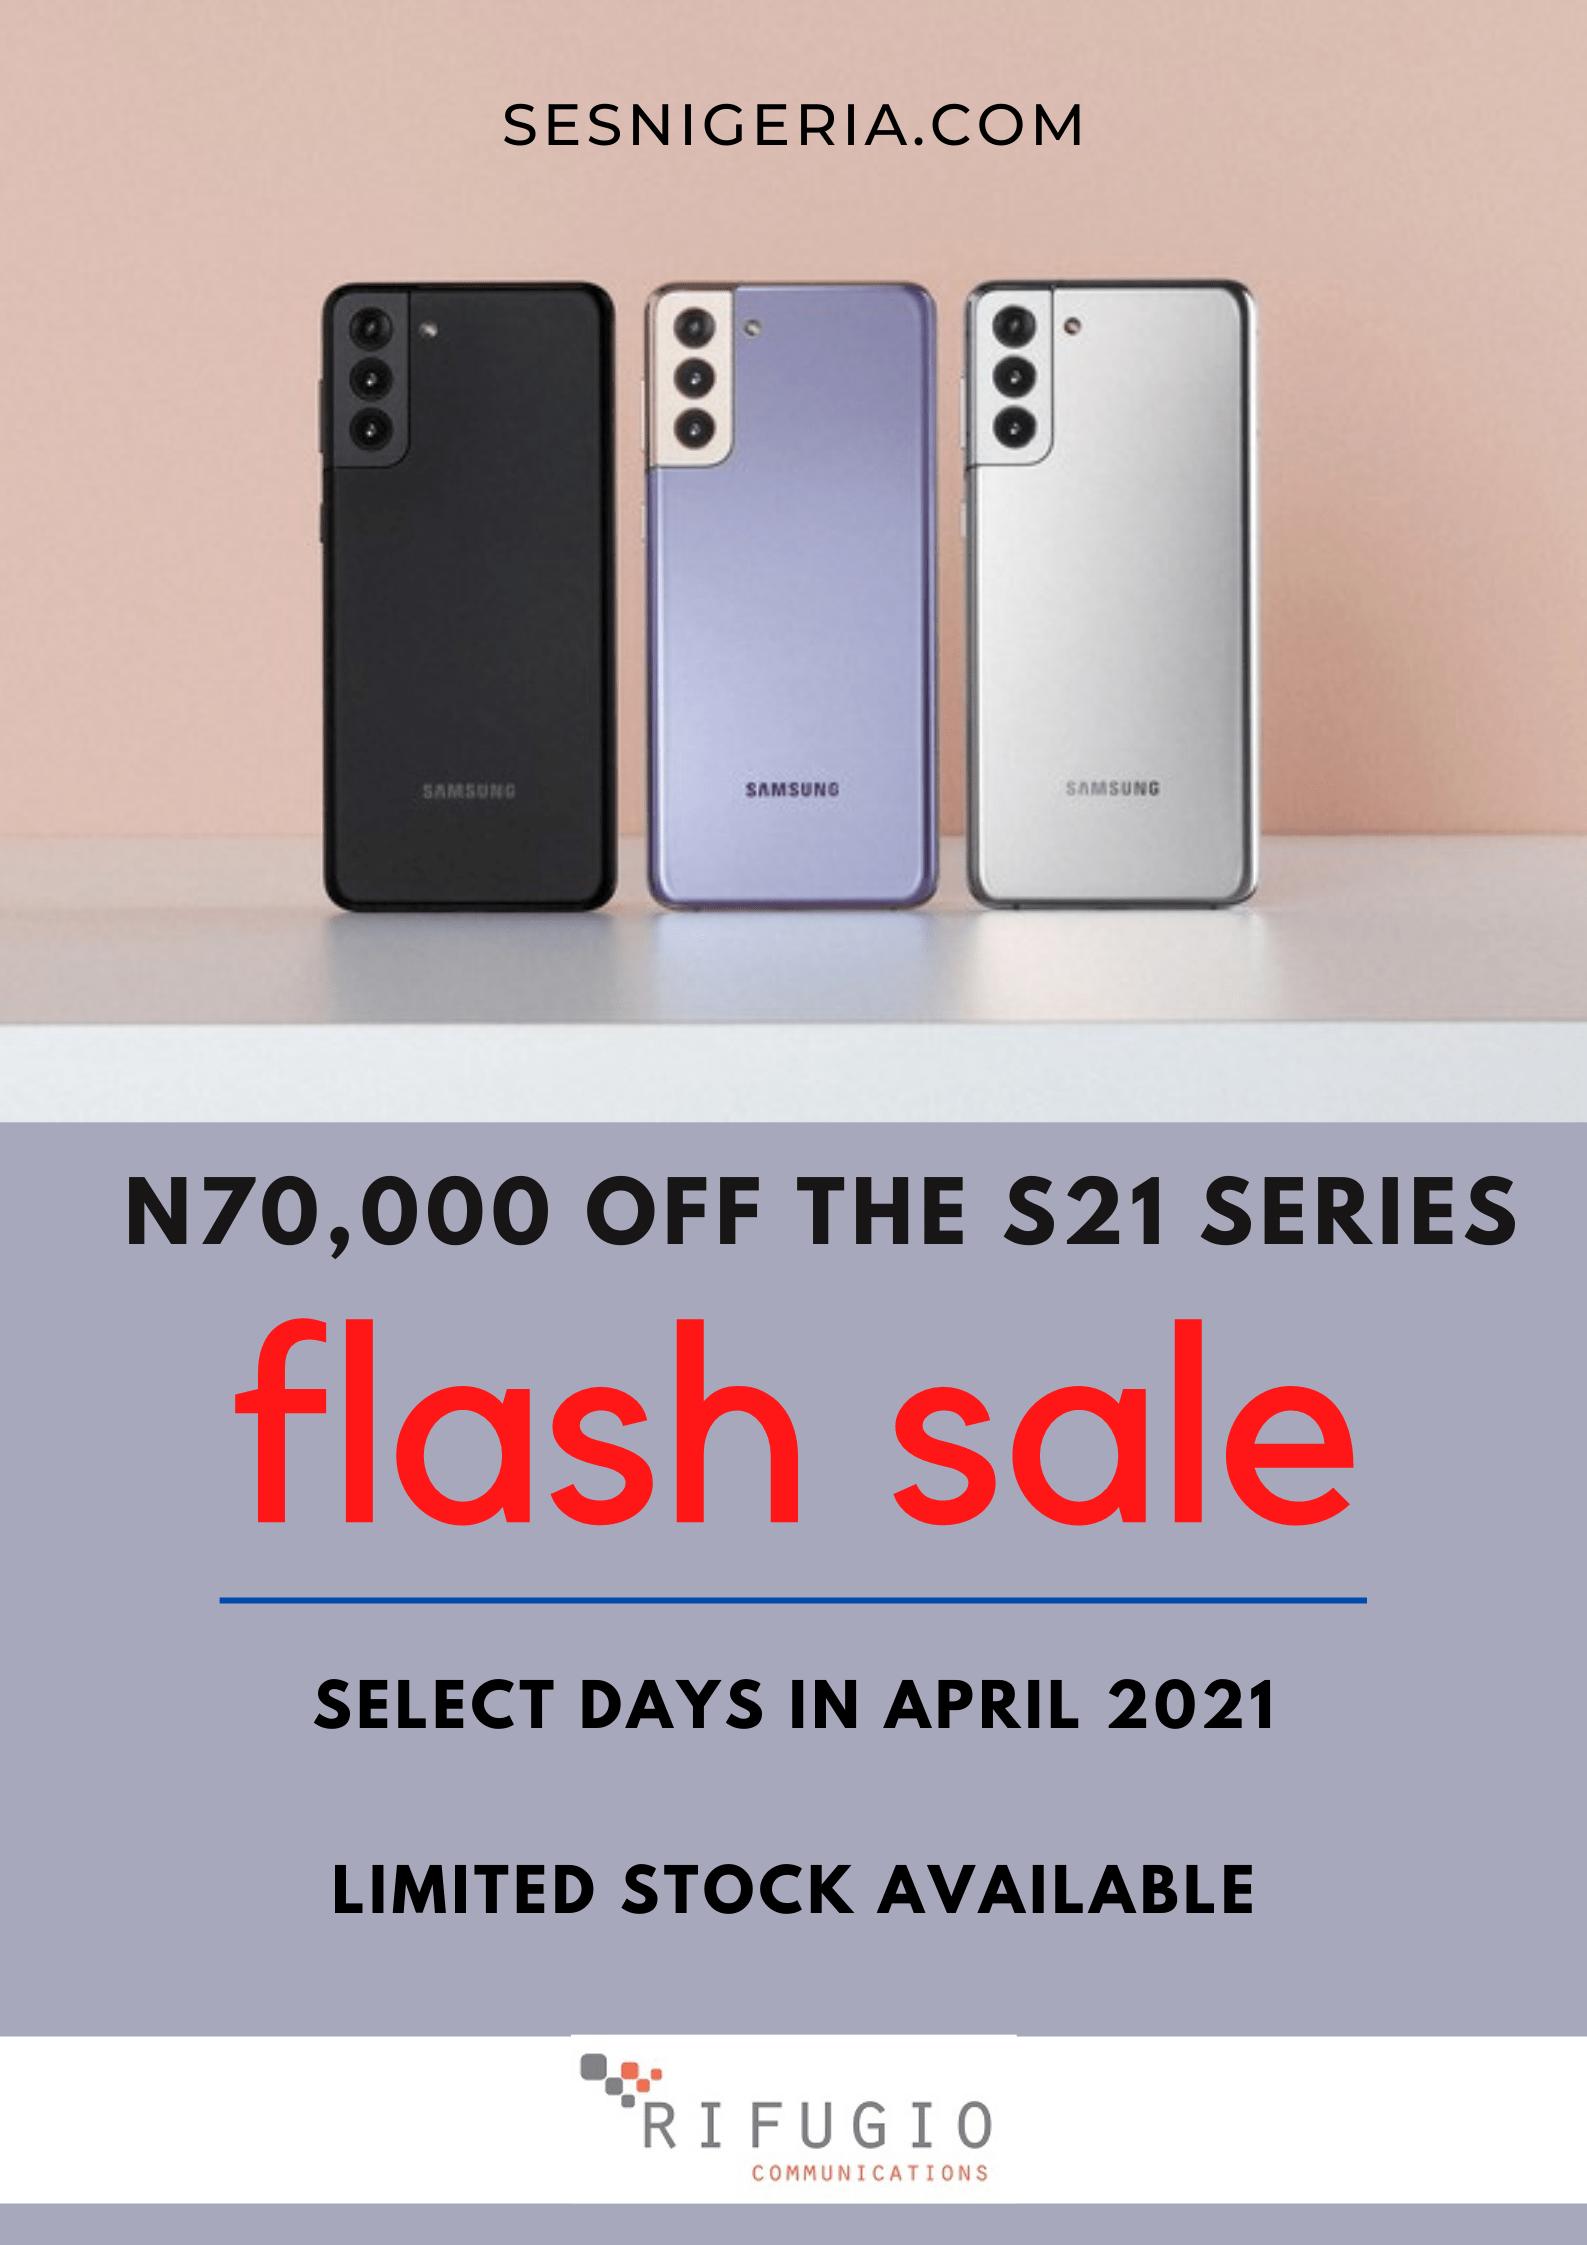 s21 flash sale promo in nigeria